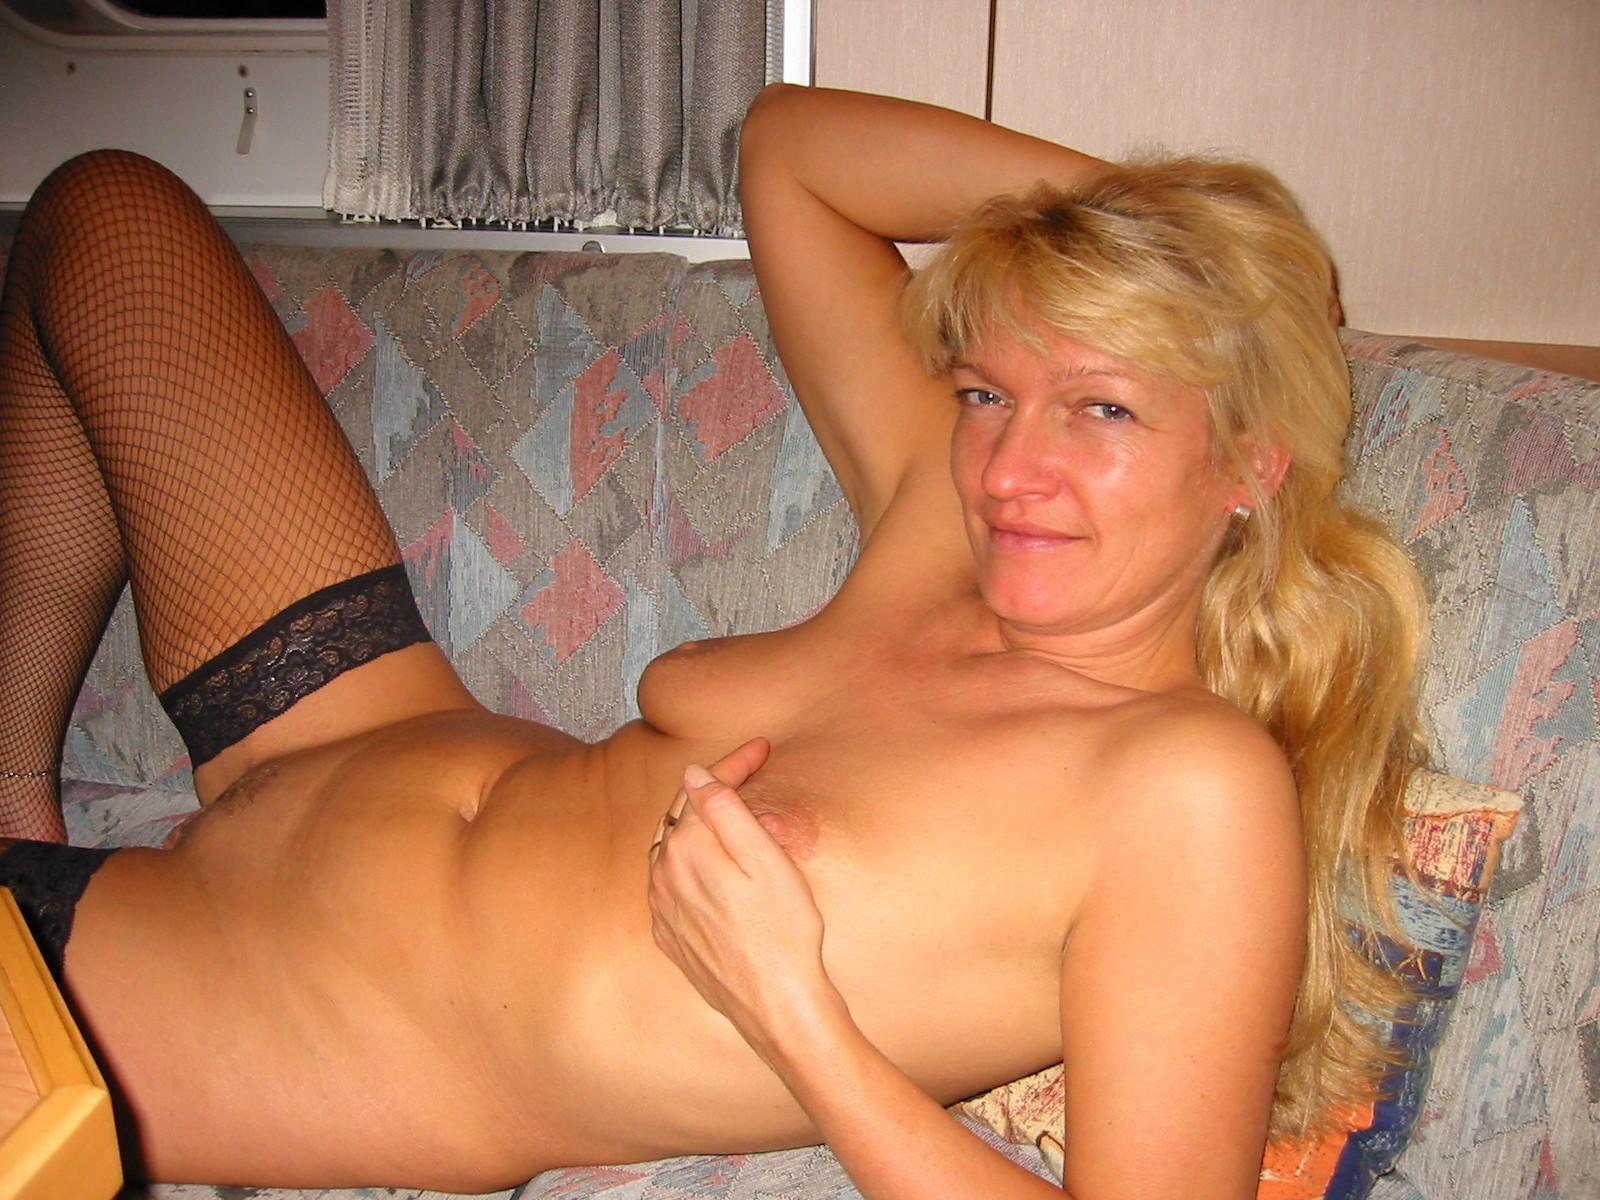 Venessa hudgens nude new